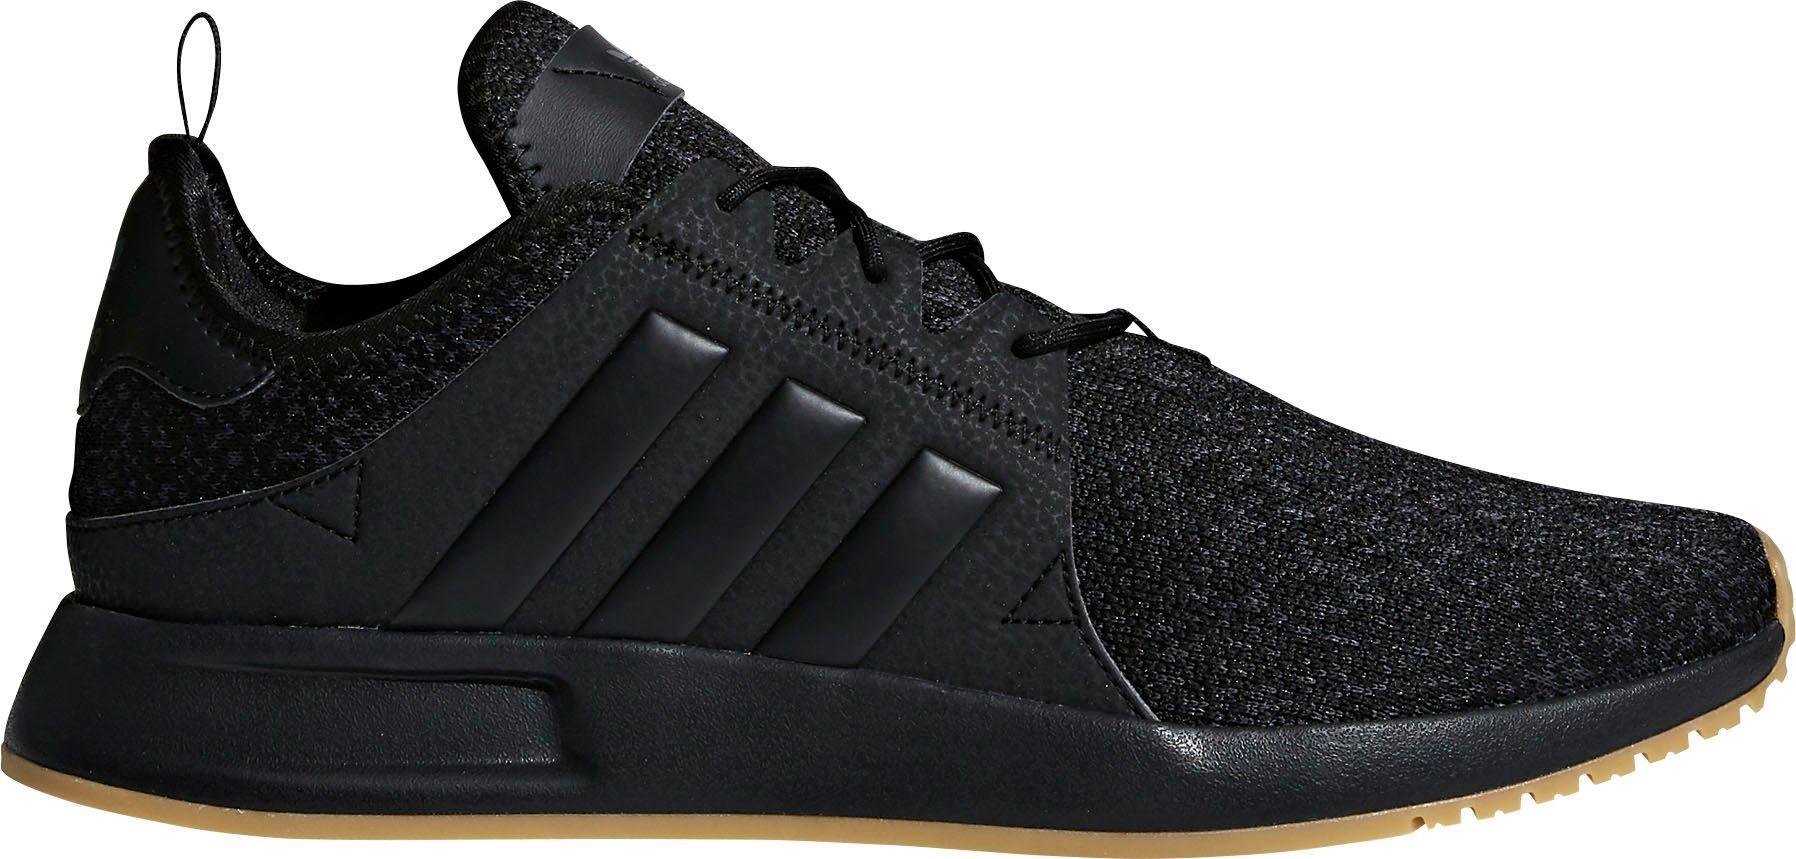 adidas Originals Men's X_plr Shoes, Size: 9.5, Black